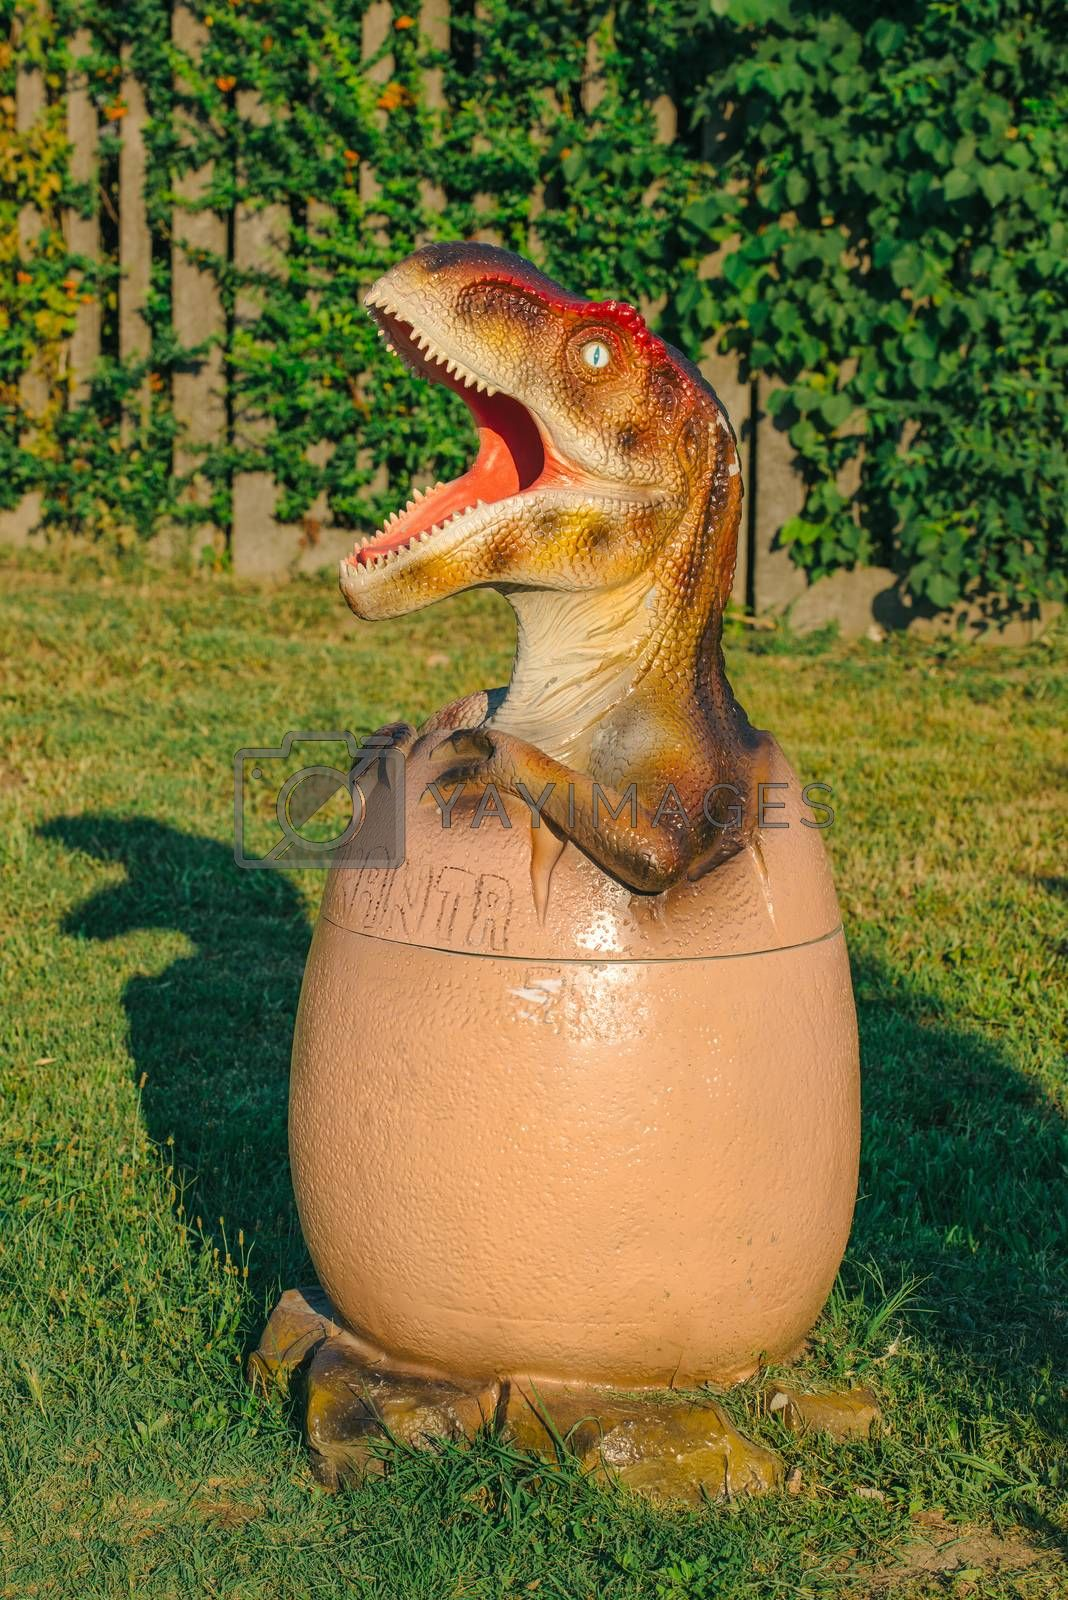 NOVI SAD, SERBIA - AUGUST 5, 2016: Small dinosaur trash bin toy from themed entertainment Dino Park in Novi Sad.